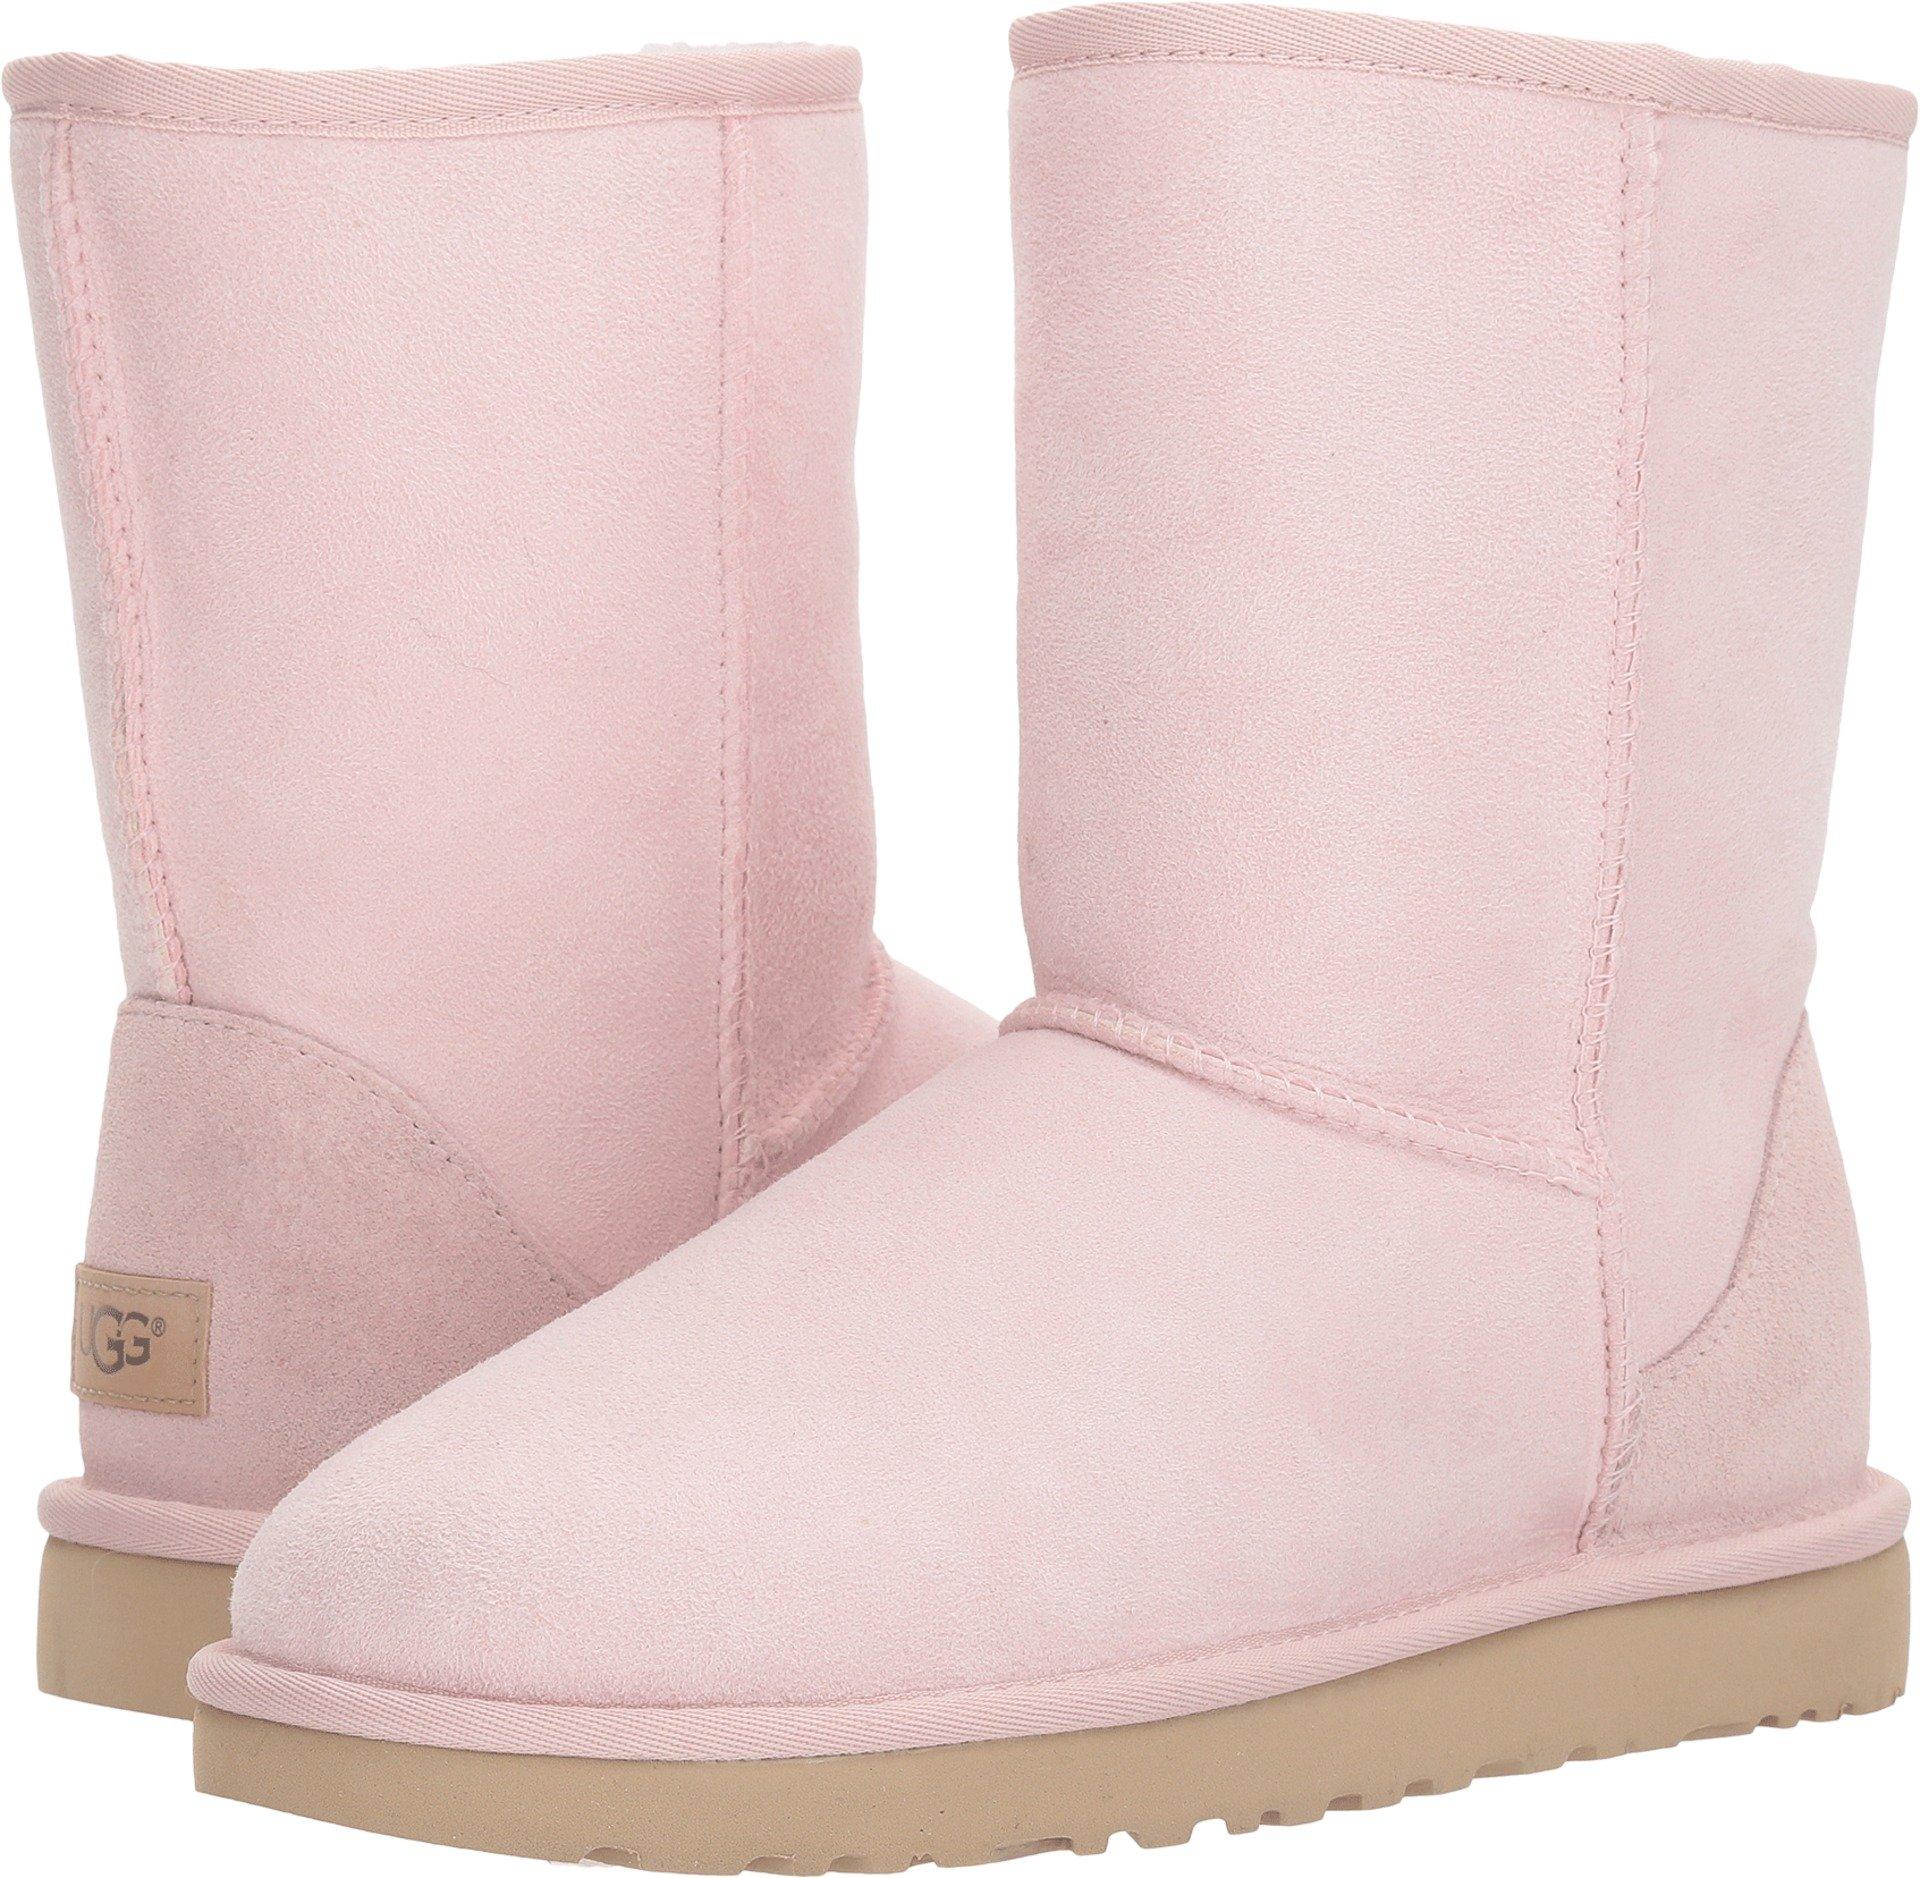 UGG Women's Classic Short II Fashion Boot, Seashell Pink, 8 M US